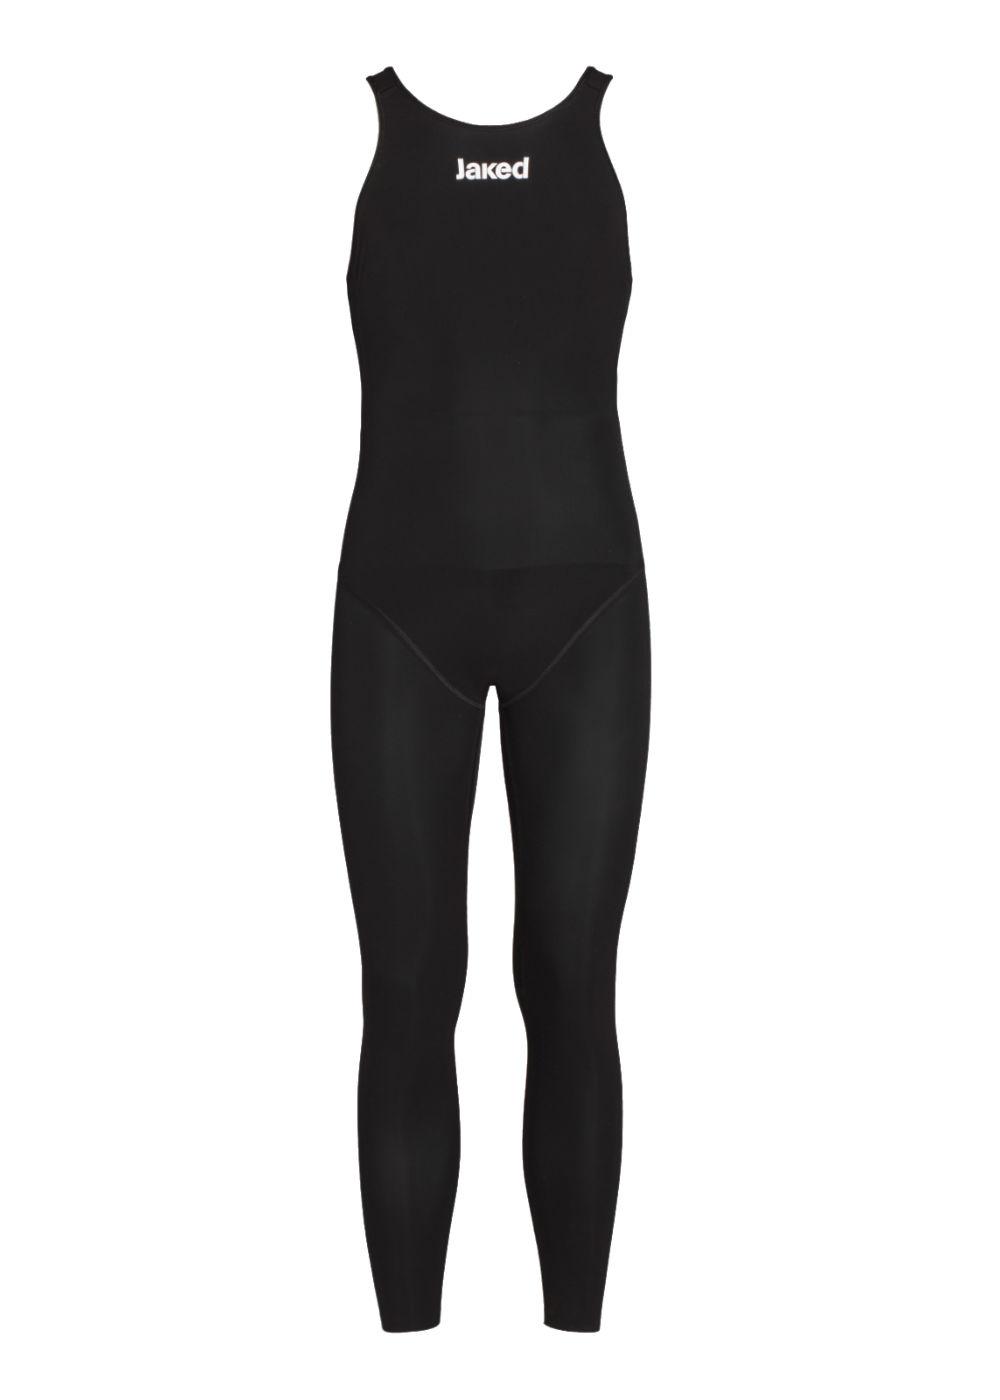 Jaked J17 FML man open water suit